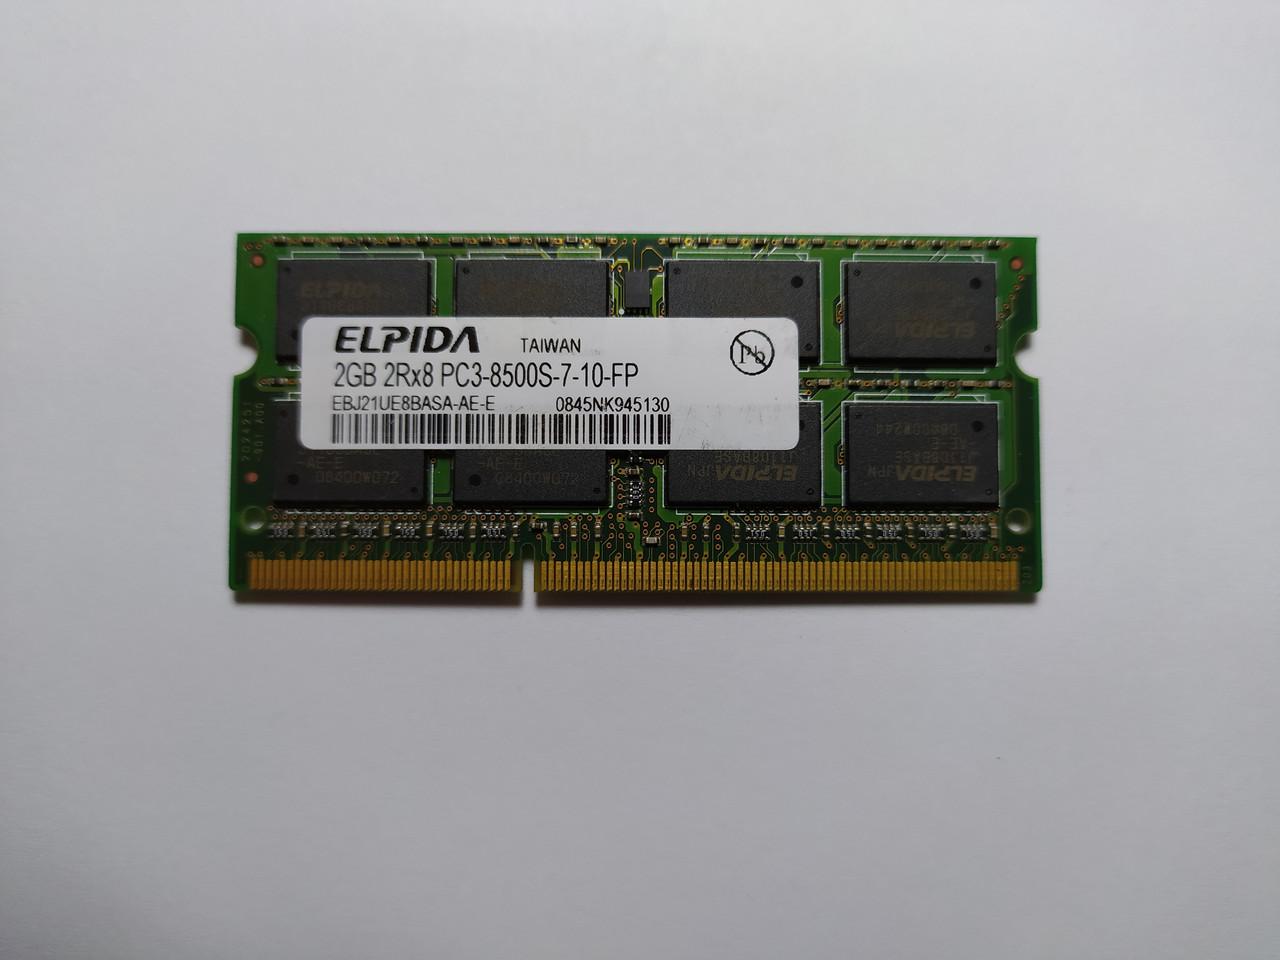 Оперативная память для ноутбука SODIMM Elpida DDR3 2Gb 1066MHz PC3-8500S (EBJ21UE8BASA-AE-E) Б/У